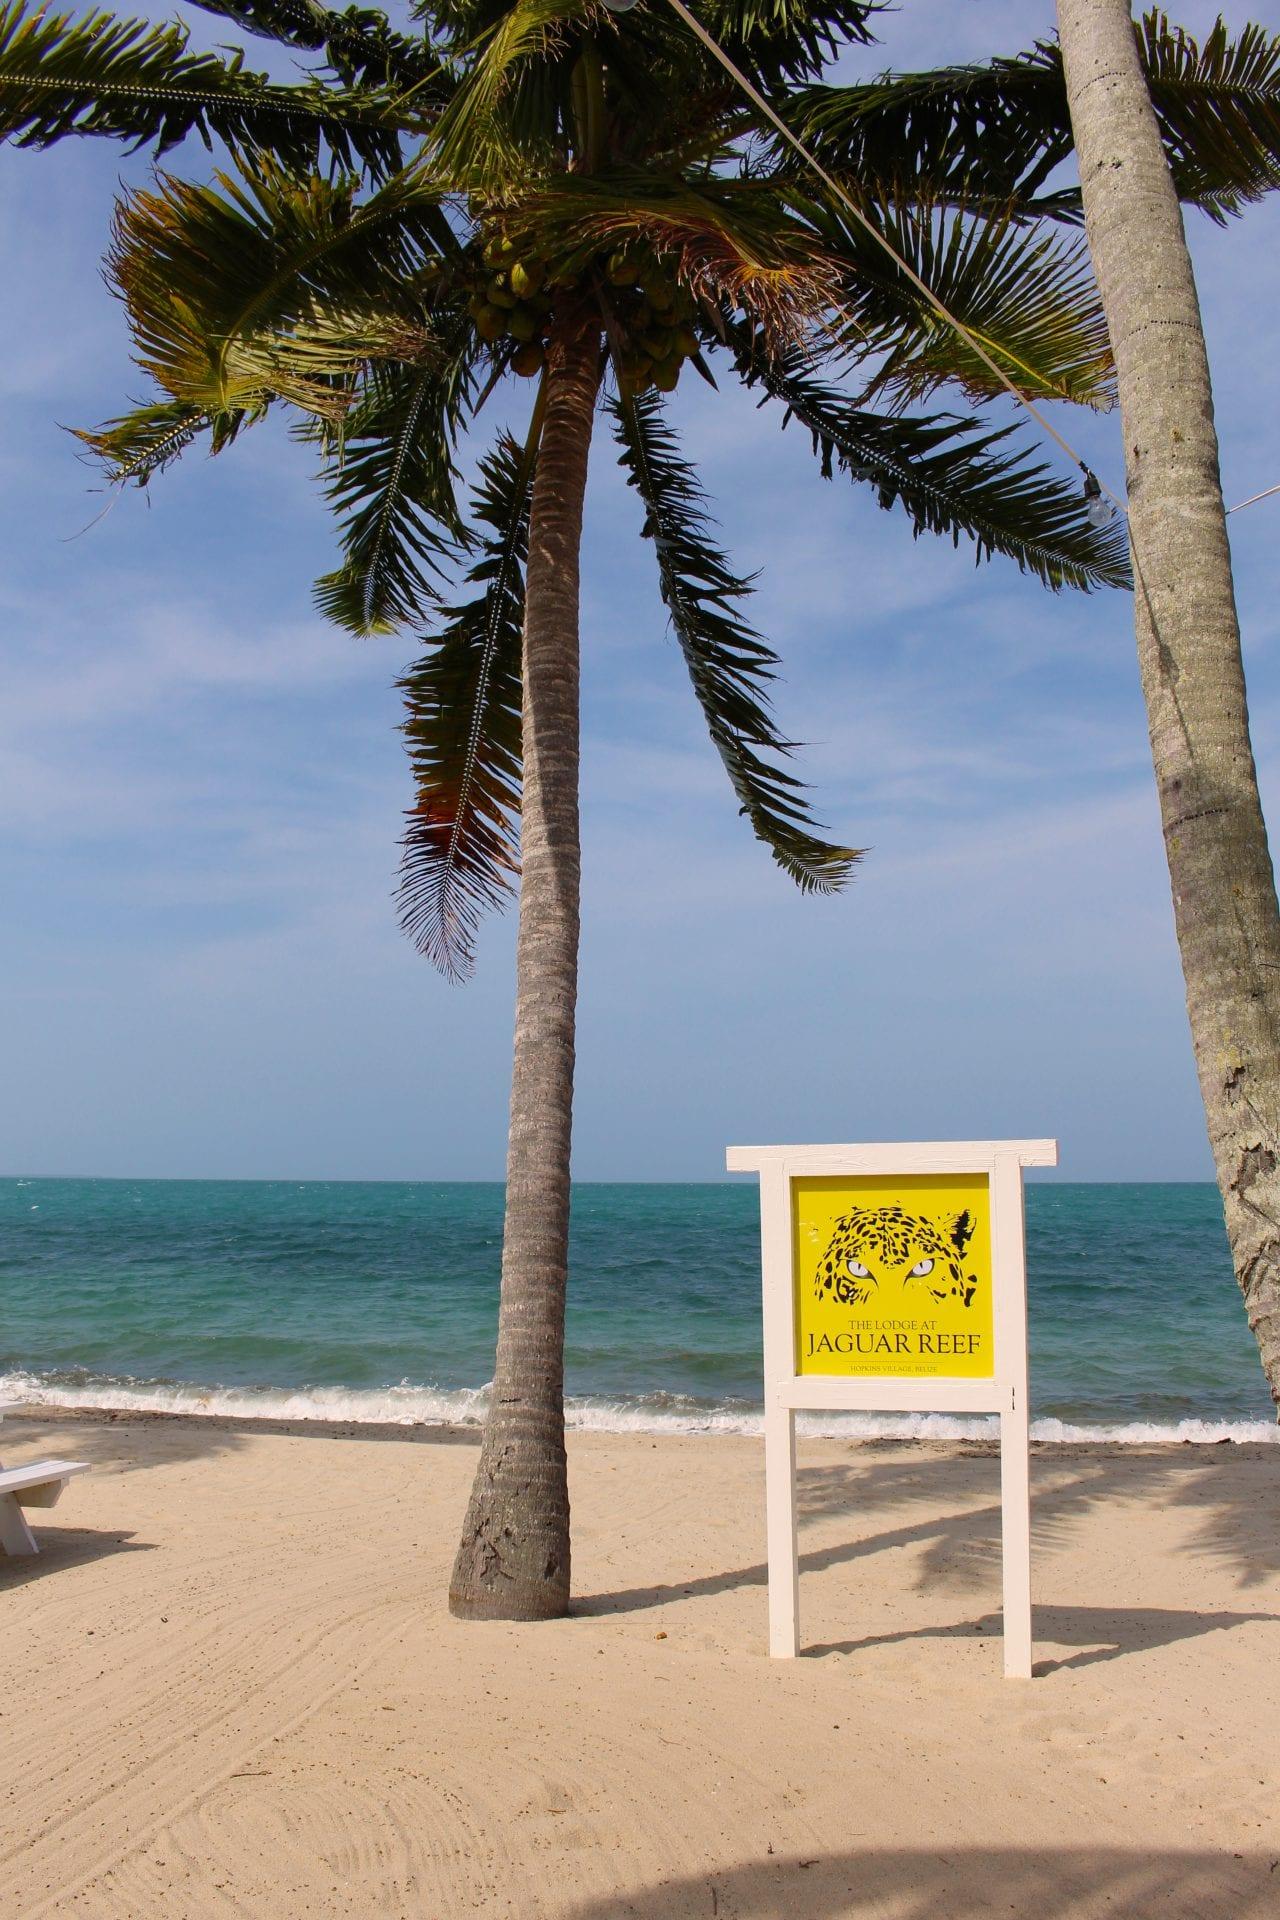 Jaguar Reef lodge beach sign cchanona